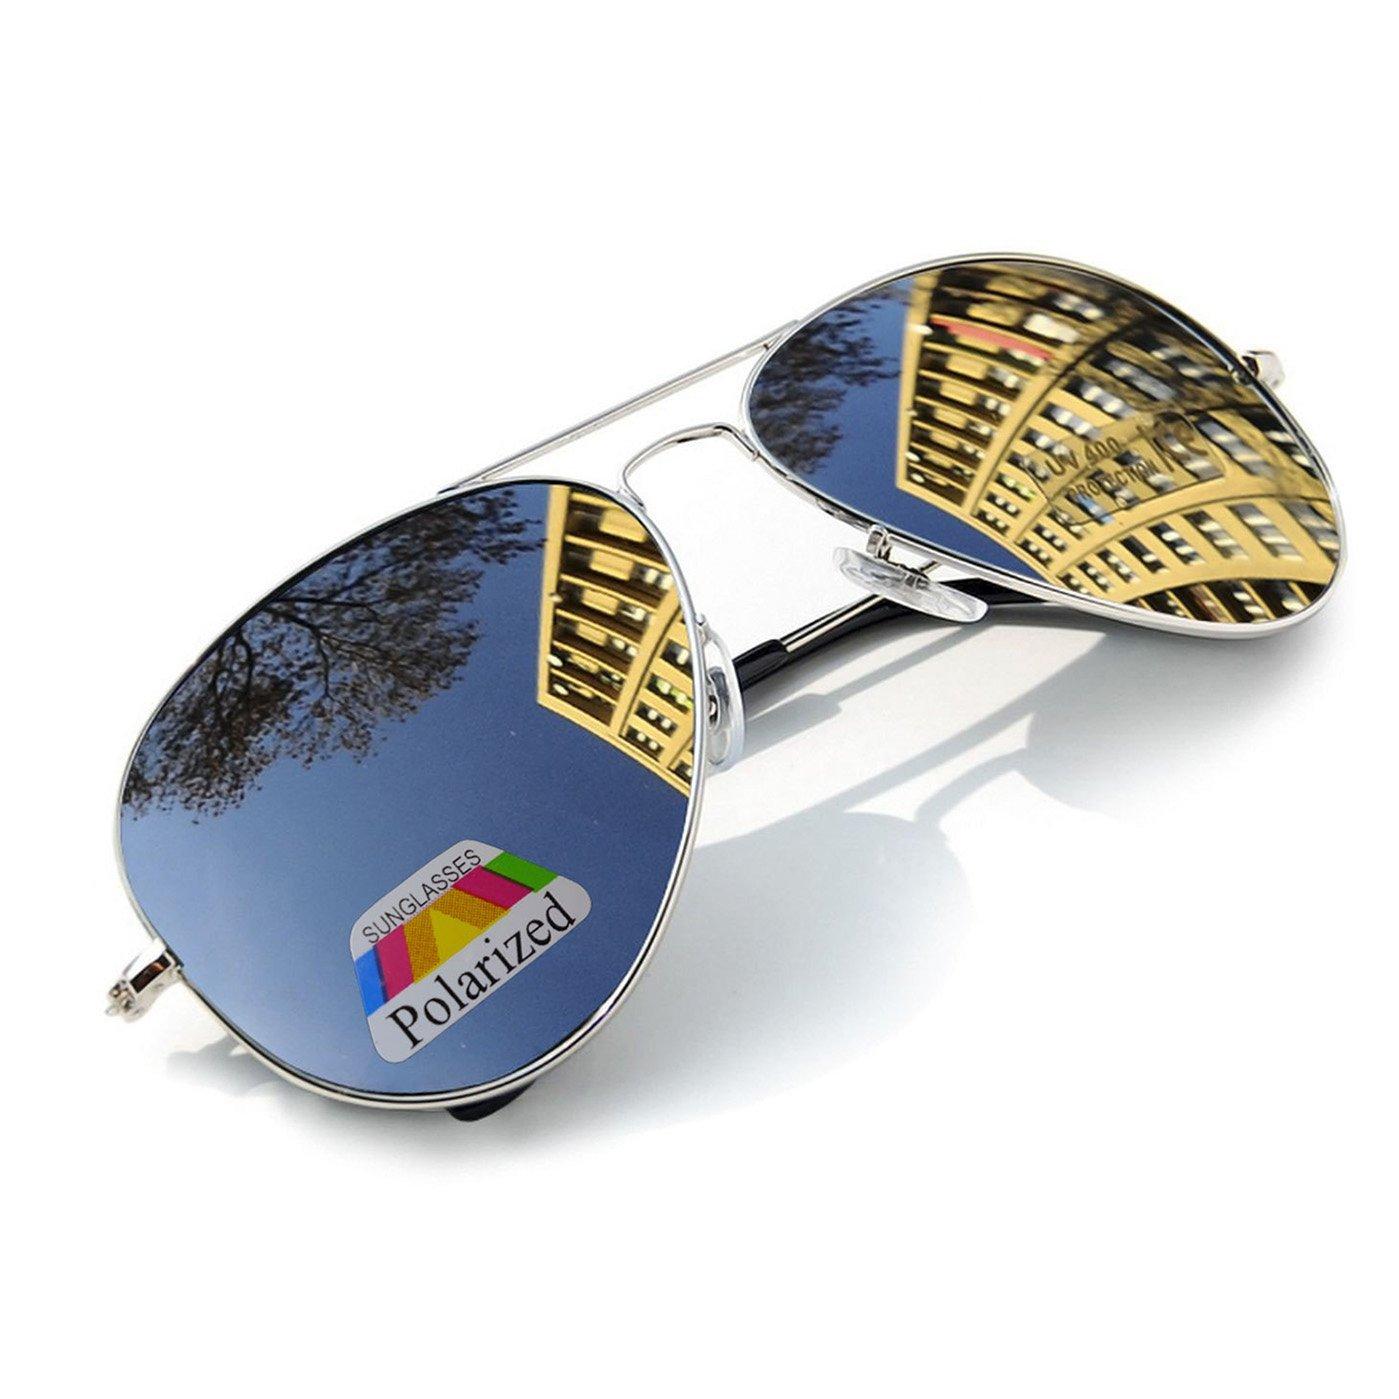 4sold Vintage Retro Original Mirror lens Polarized Sunglasses Glasses Air Force Unisex UV 400 Protection avi 1976 5060474730822